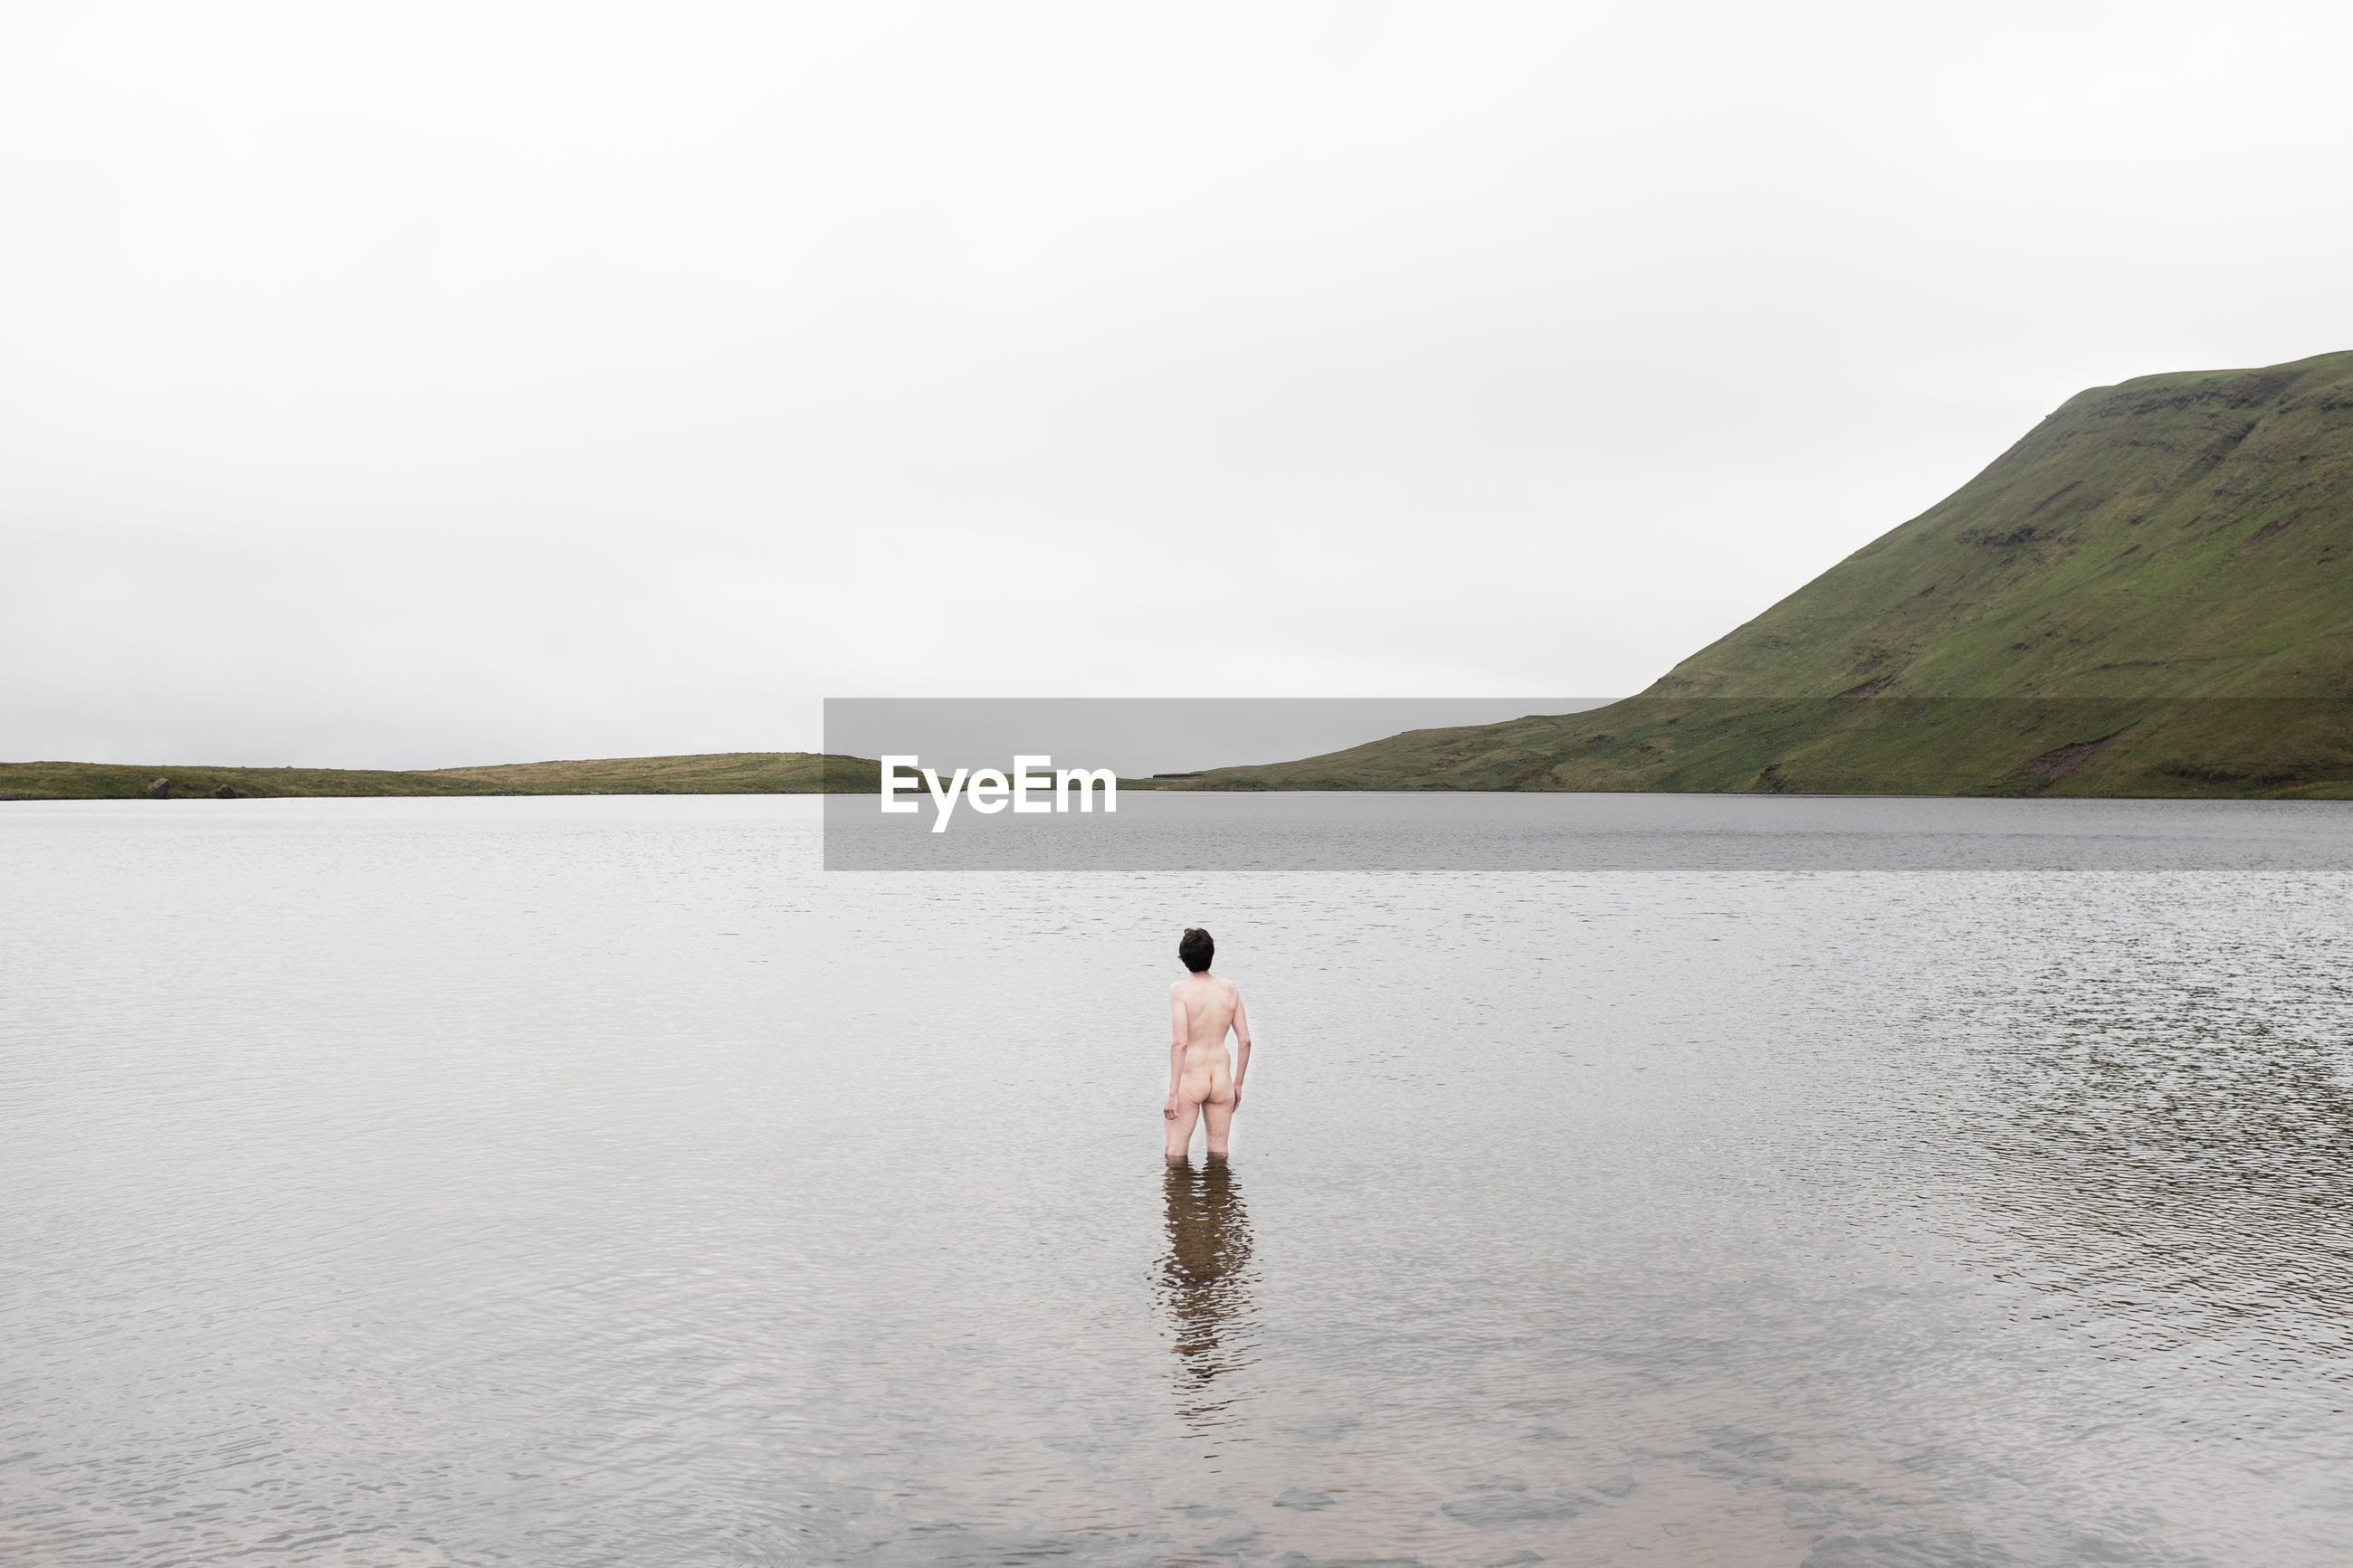 Naked man standing in lake against sky